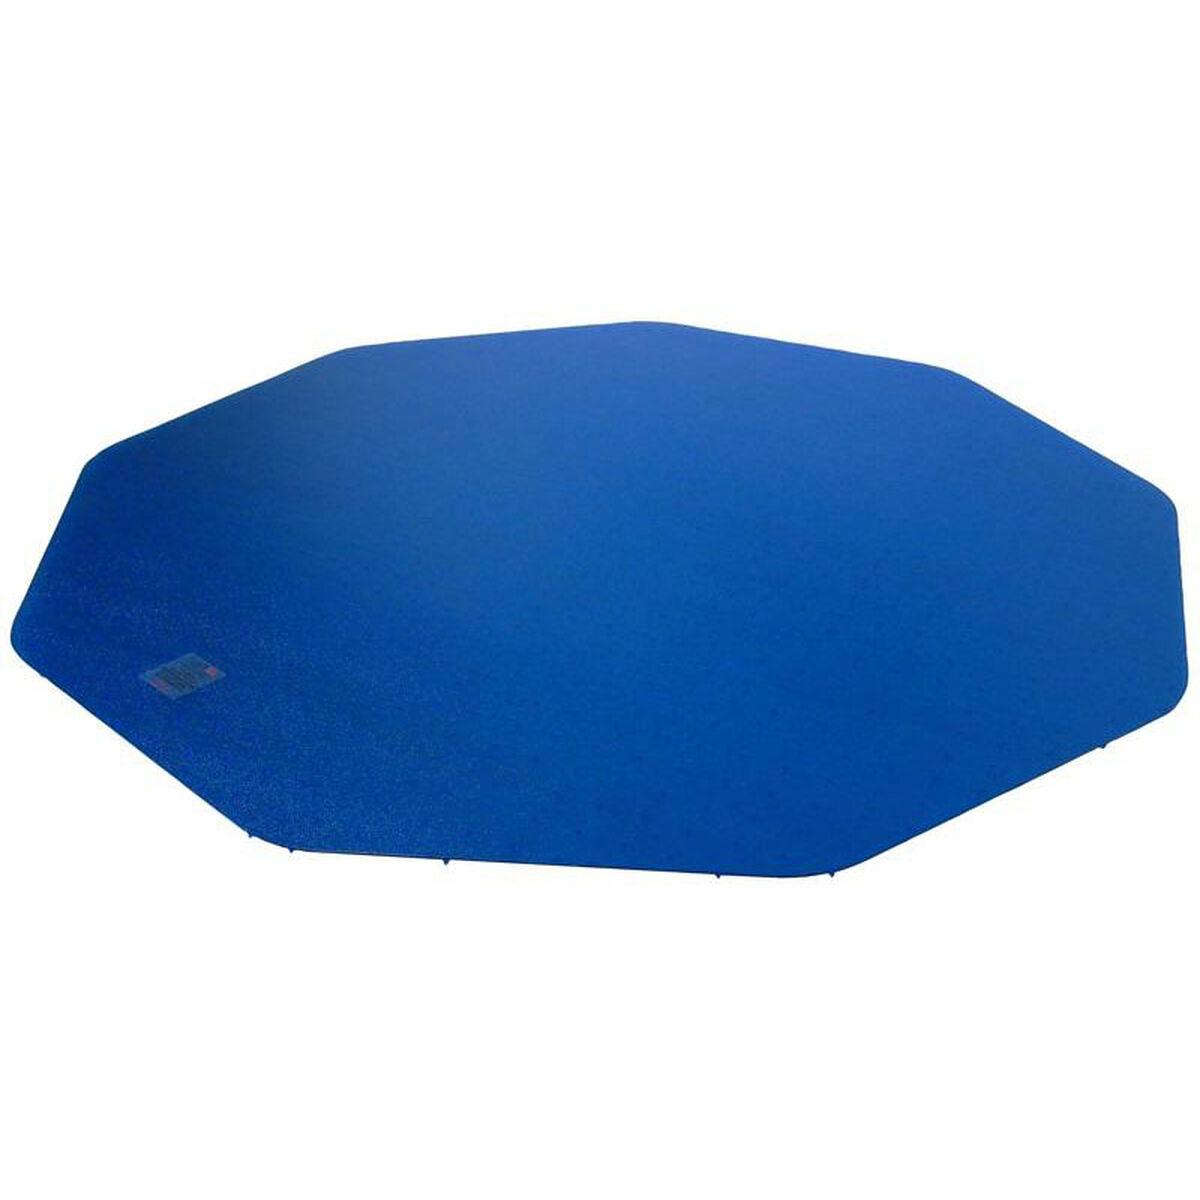 Ultimat Chairmat Low Med Carpet FC111001009RBL